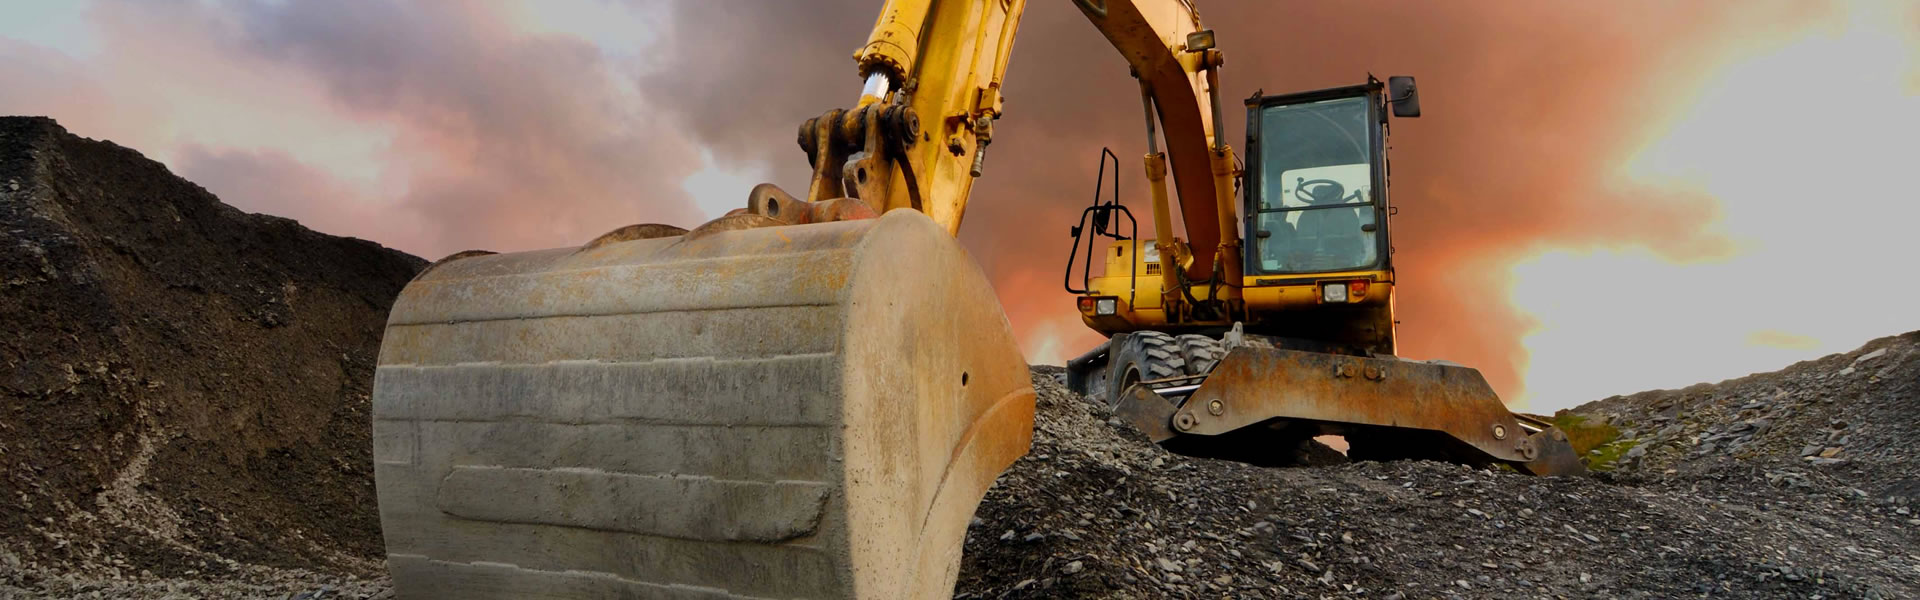 Excavating-Trenching-Ohio